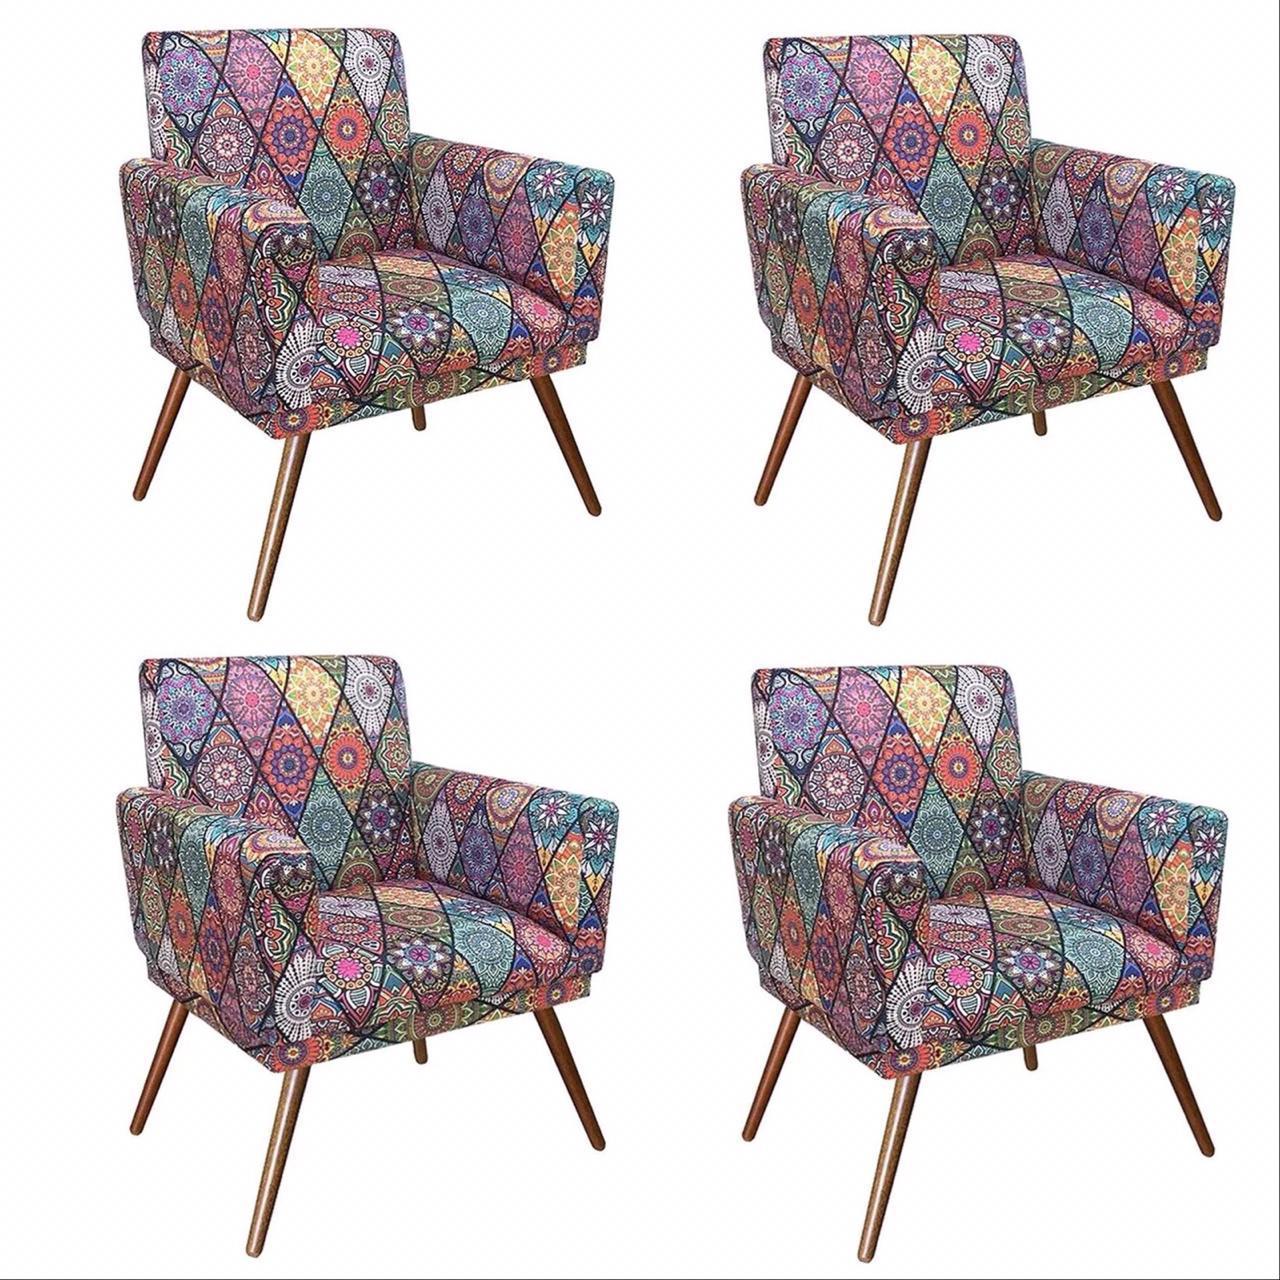 Kit 04 Poltrona Decorativa Nina com rodapés Mosaico- Bela Casa Shop